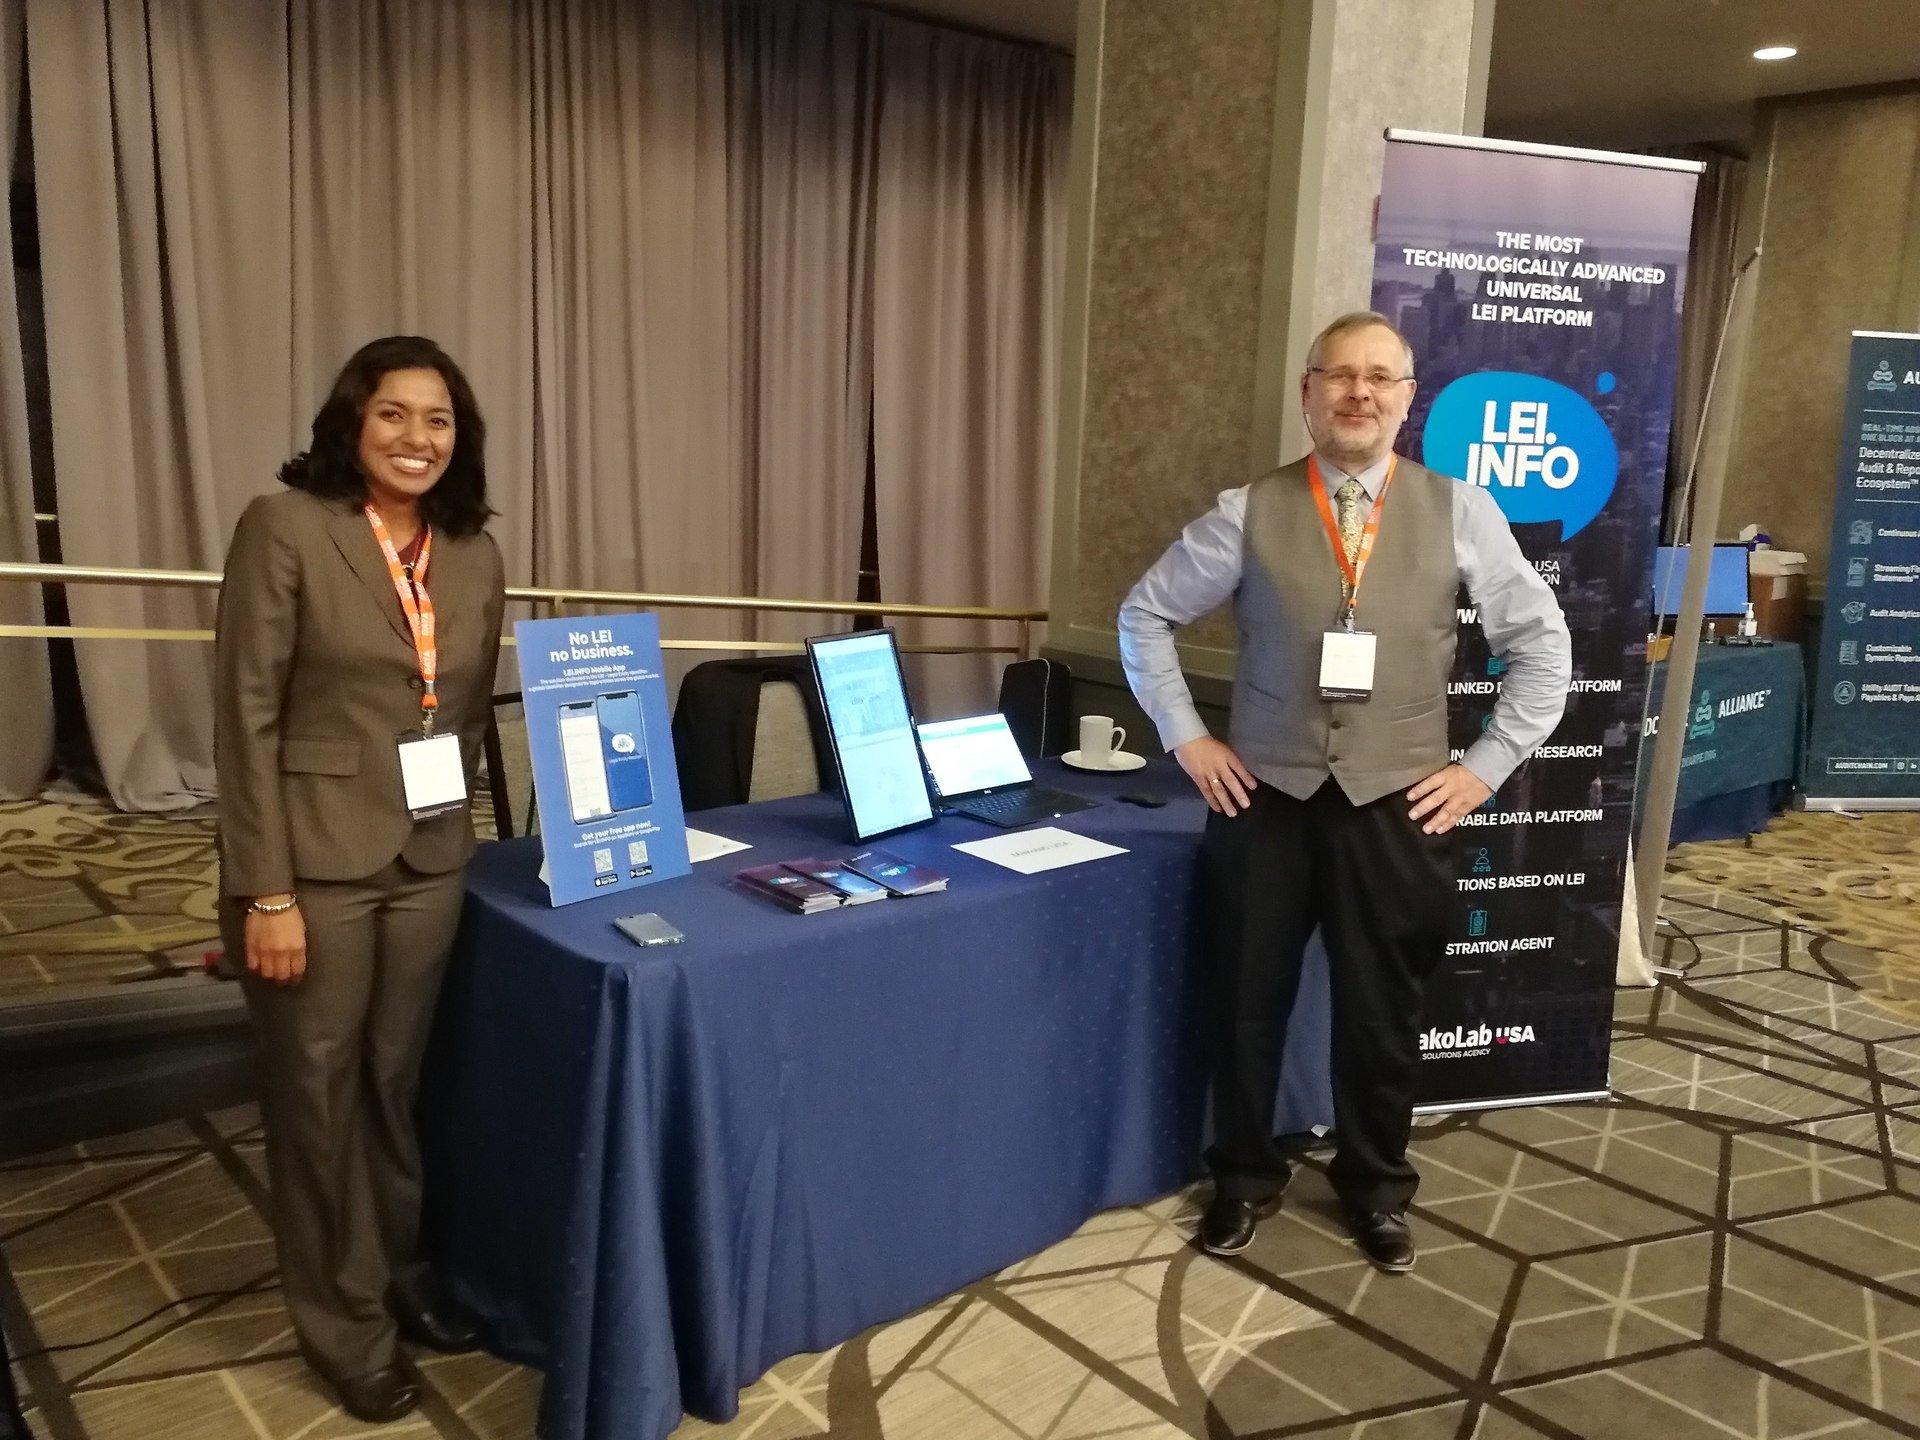 MakoLab presents the new LEI.INFO SAAS Platform at RegTech Data Summit 2018